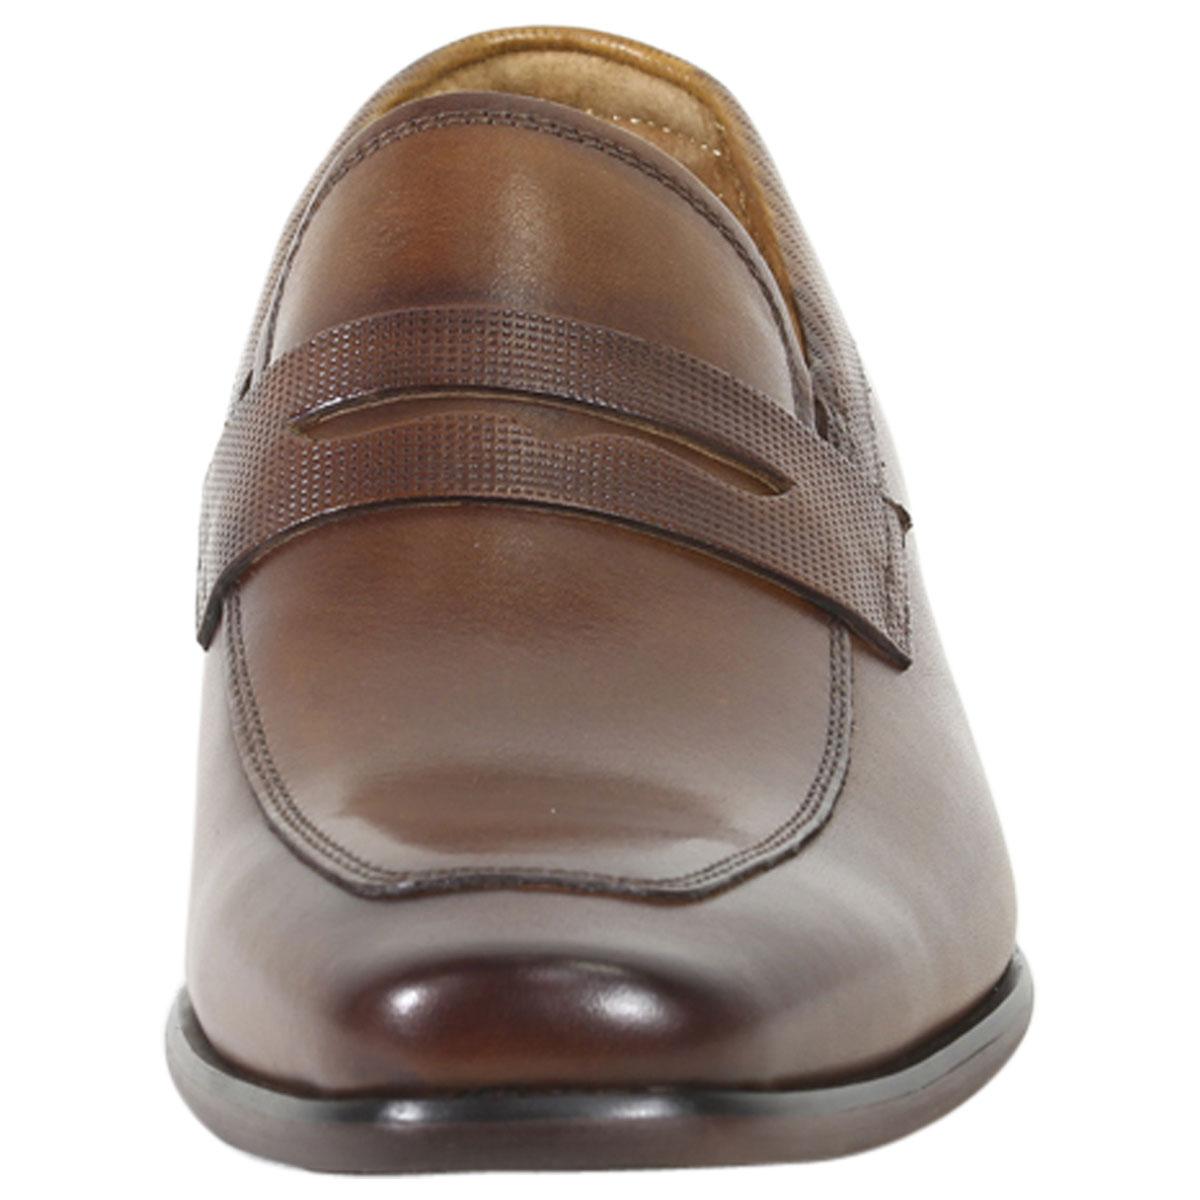 Florsheim-Men-039-s-Postino-Penny-Loafers-Shoes thumbnail 16